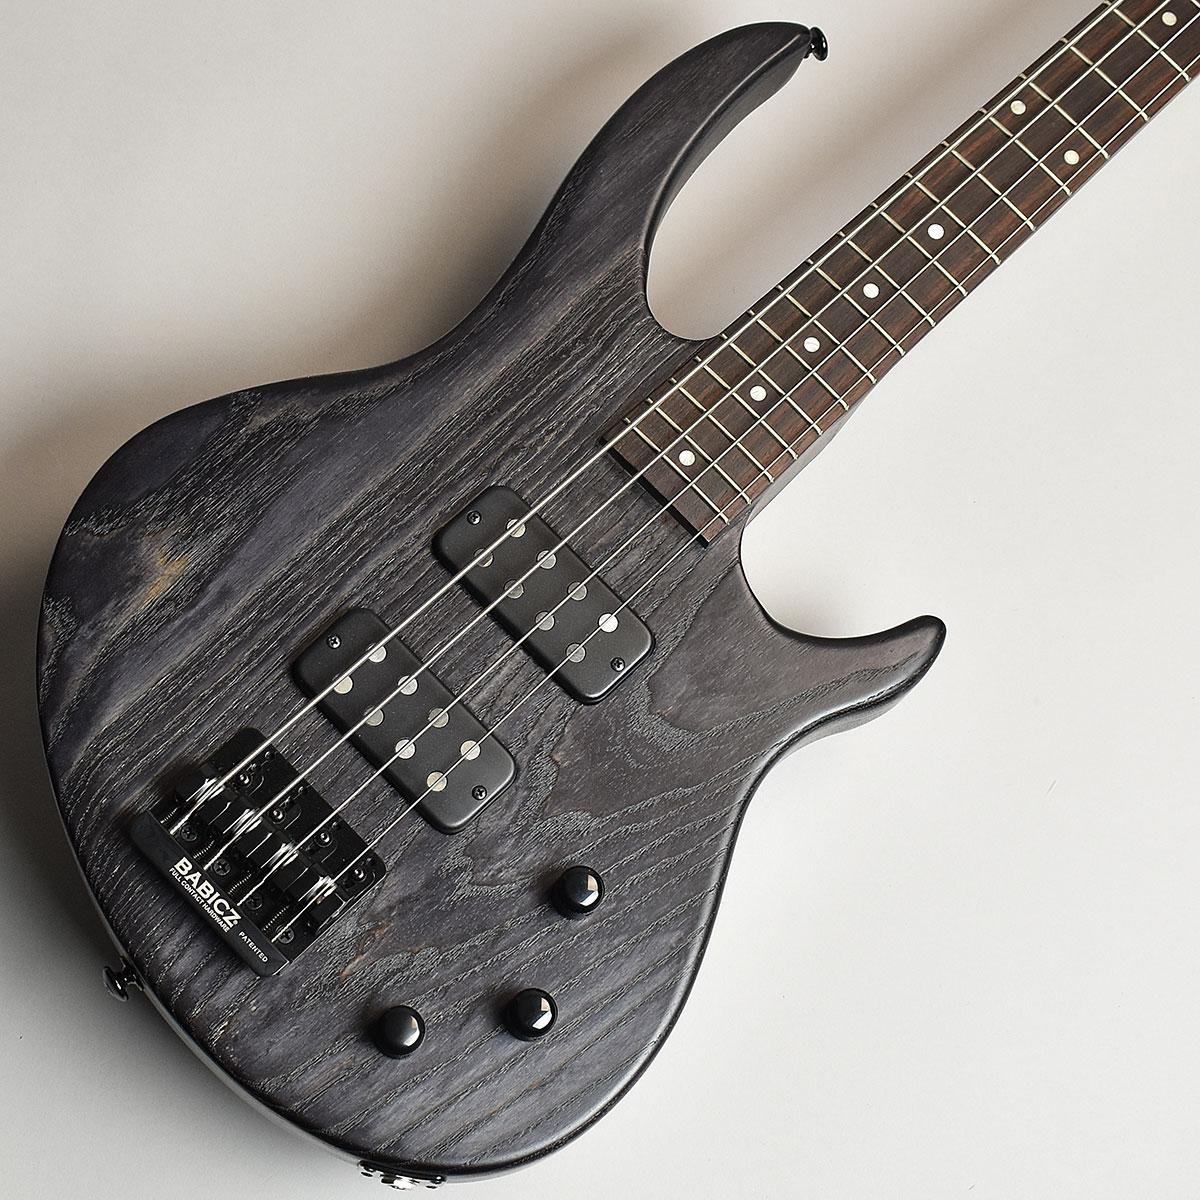 Gibson EB Bass 4-String 2018 Satin Trans Black S/N:180041886 エレキベース 【ギブソン】【未展示品】